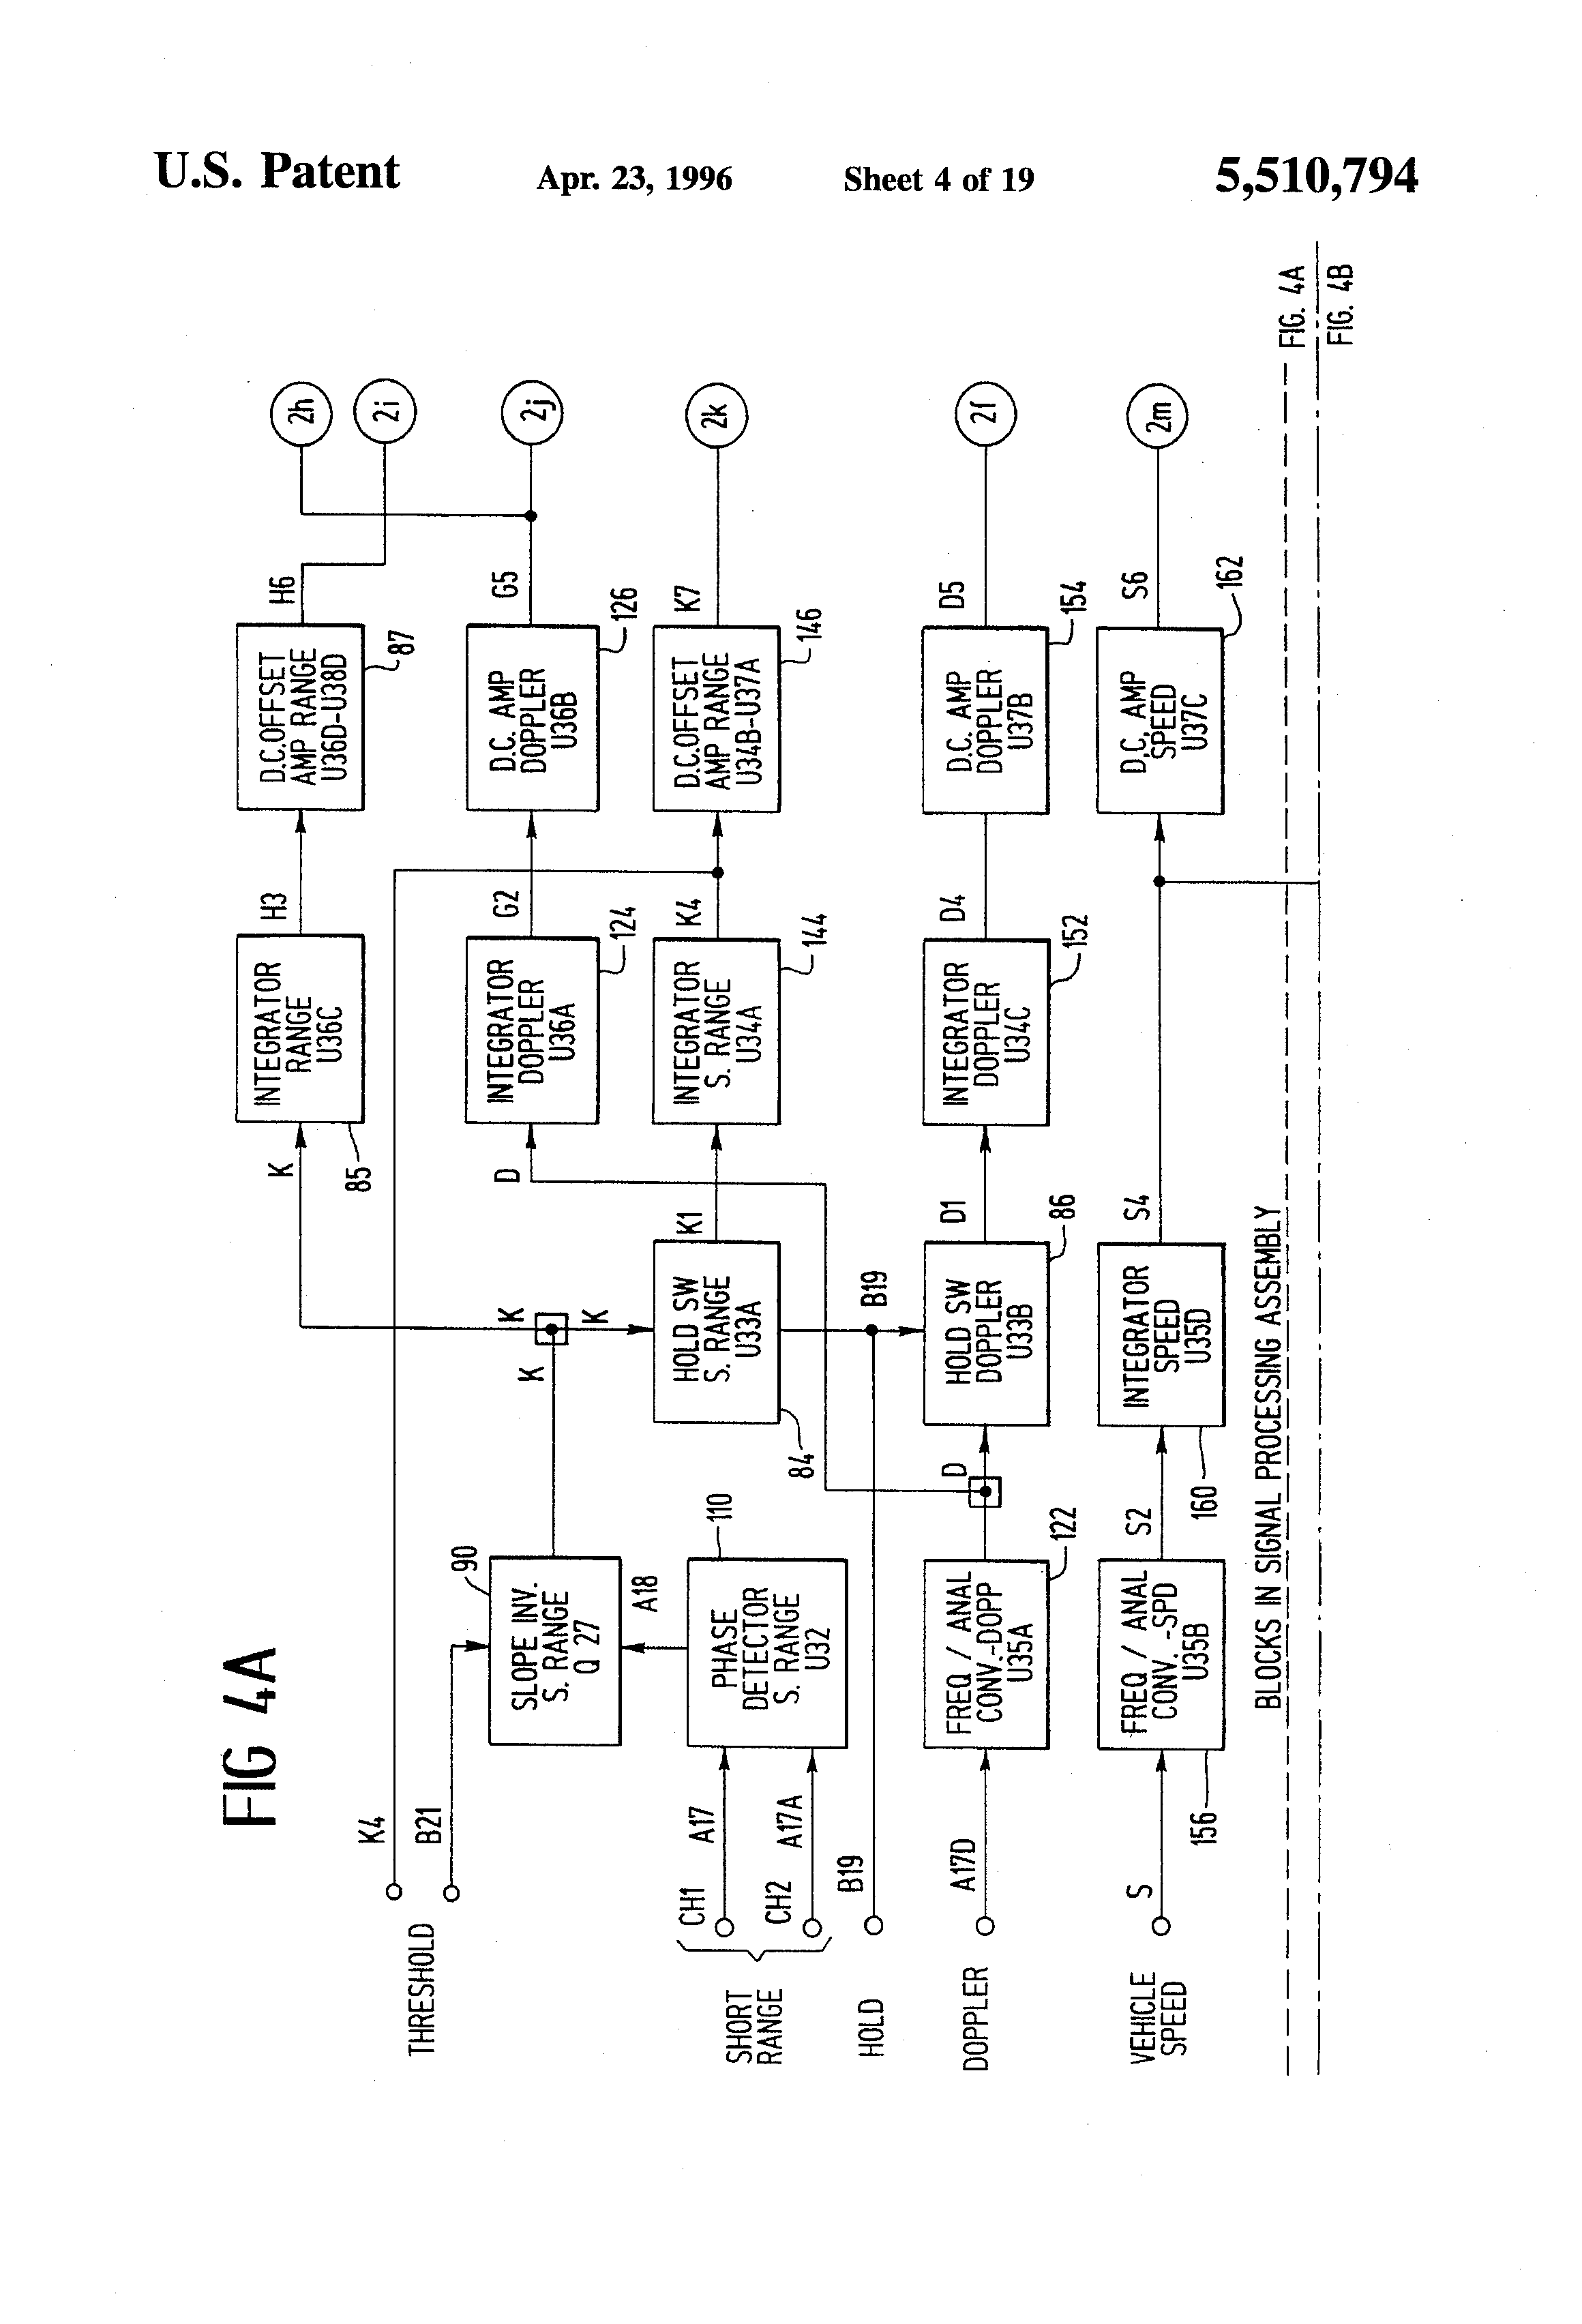 Pure Sinewave Generator Circuit Diagram Tradeoficcom Wiring Sine Wave Converter Basiccircuit Patent Us5510794 Vehicular Radar Wayside Transponder System